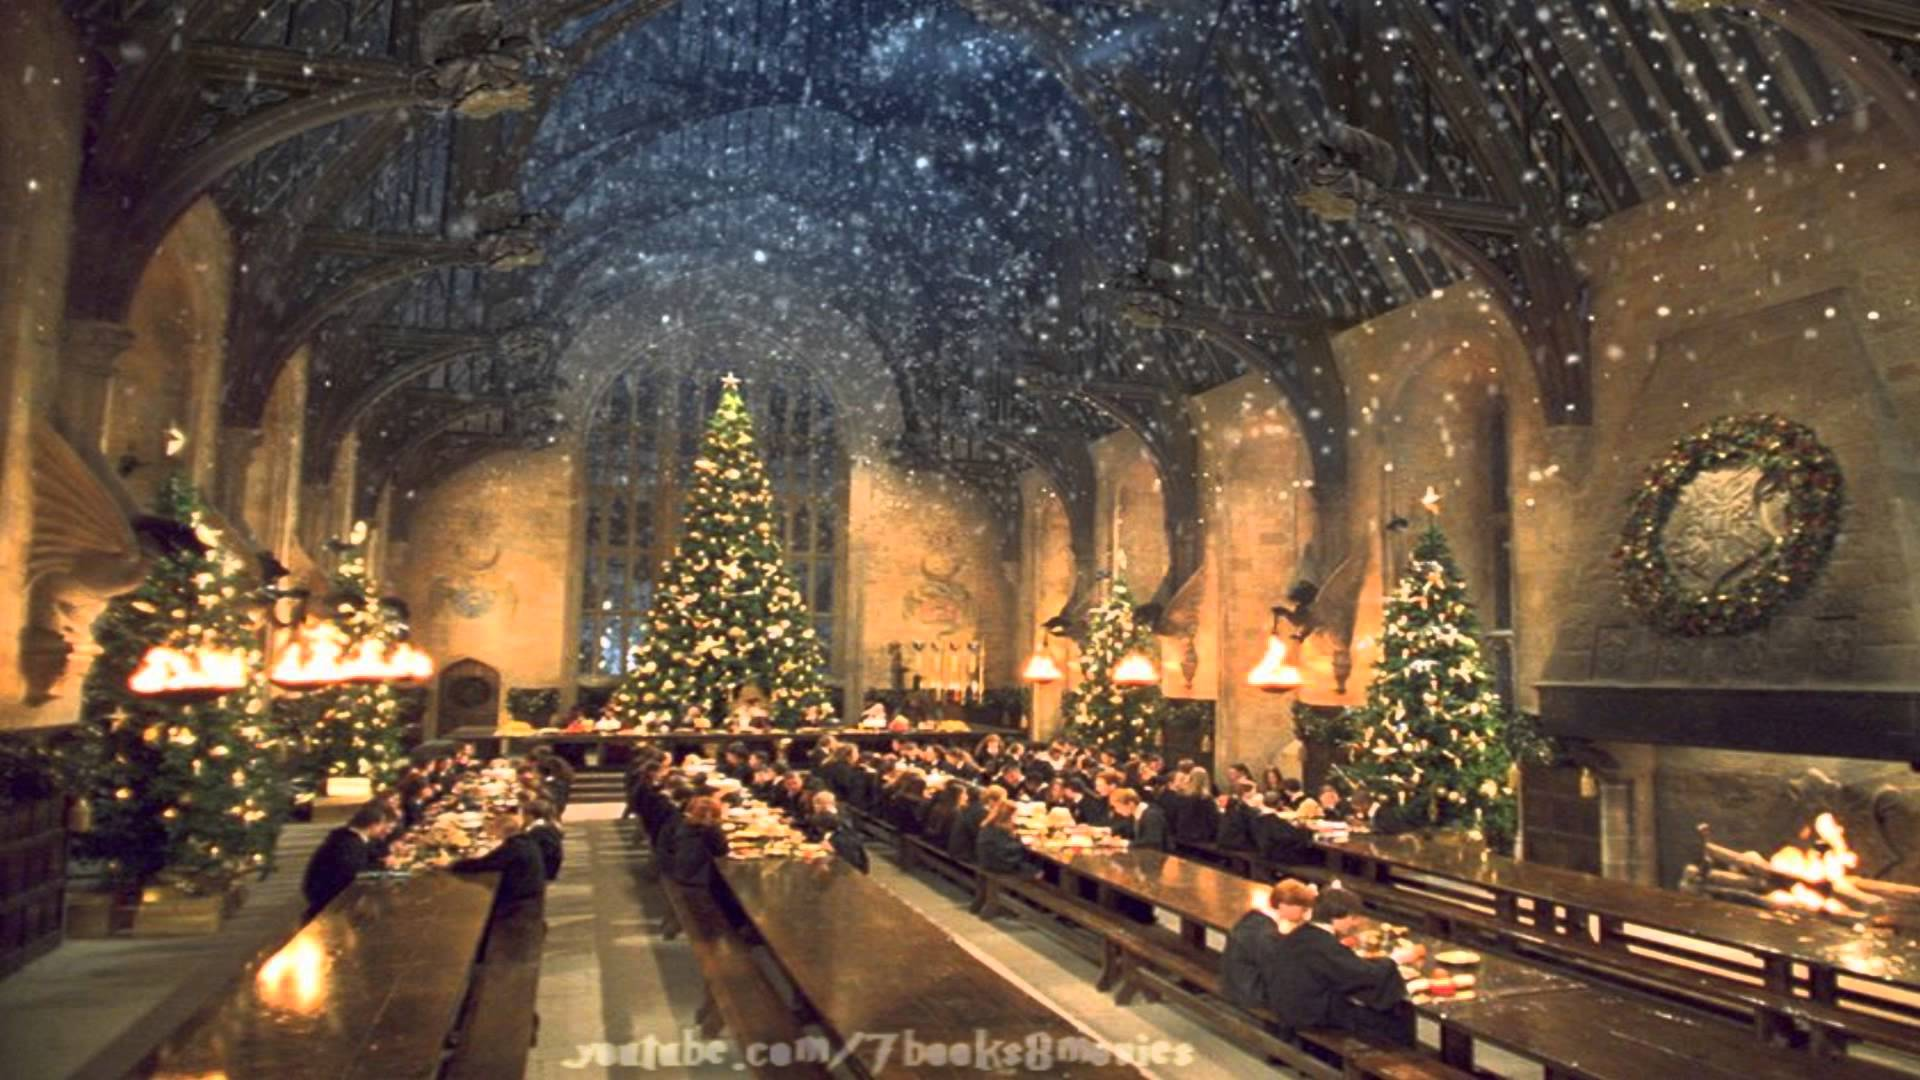 Harry Potter Christmas Wallpaper Hd.Large Harry Potter Christmas Wallpapers Top Free Large